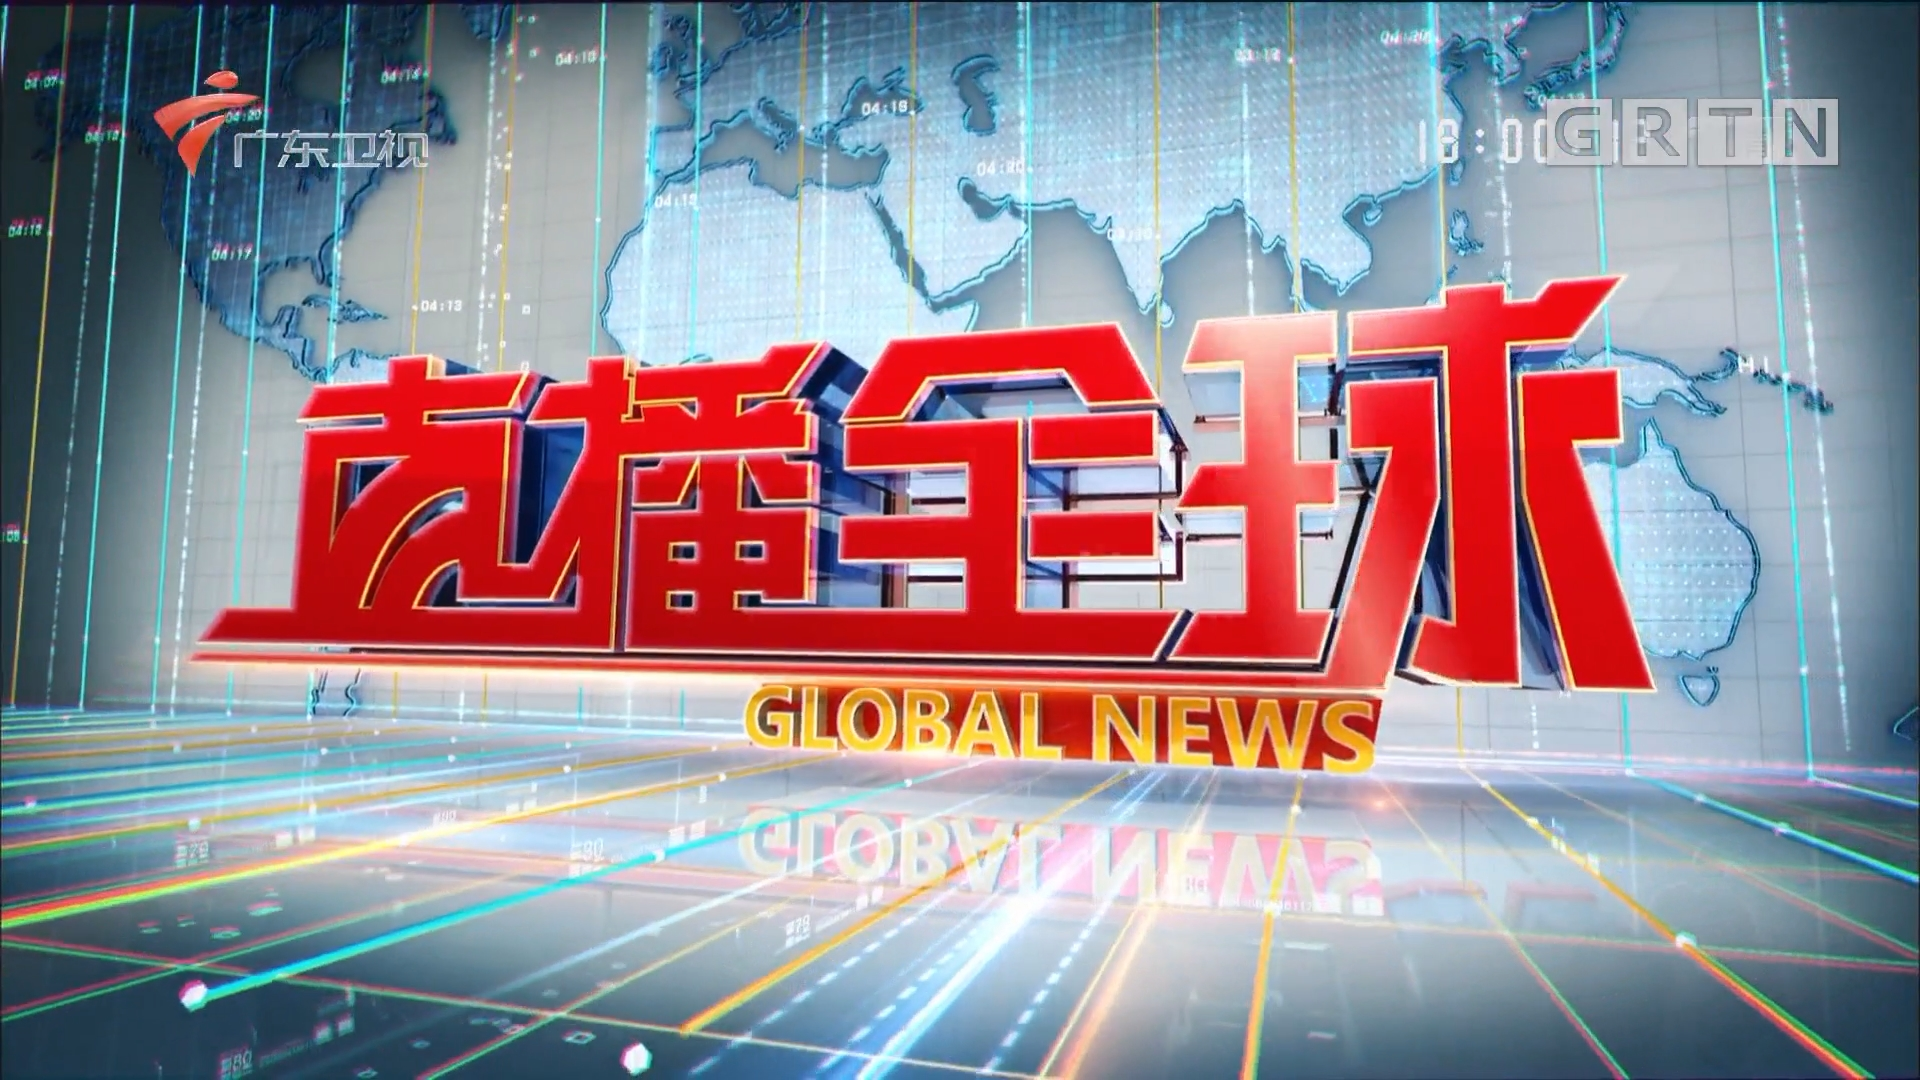 [HD][2018-05-18]直播全球:朝鲜警告:北南关系方向取决于韩方行动 朝鲜:韩美联演不停 朝韩会谈难开